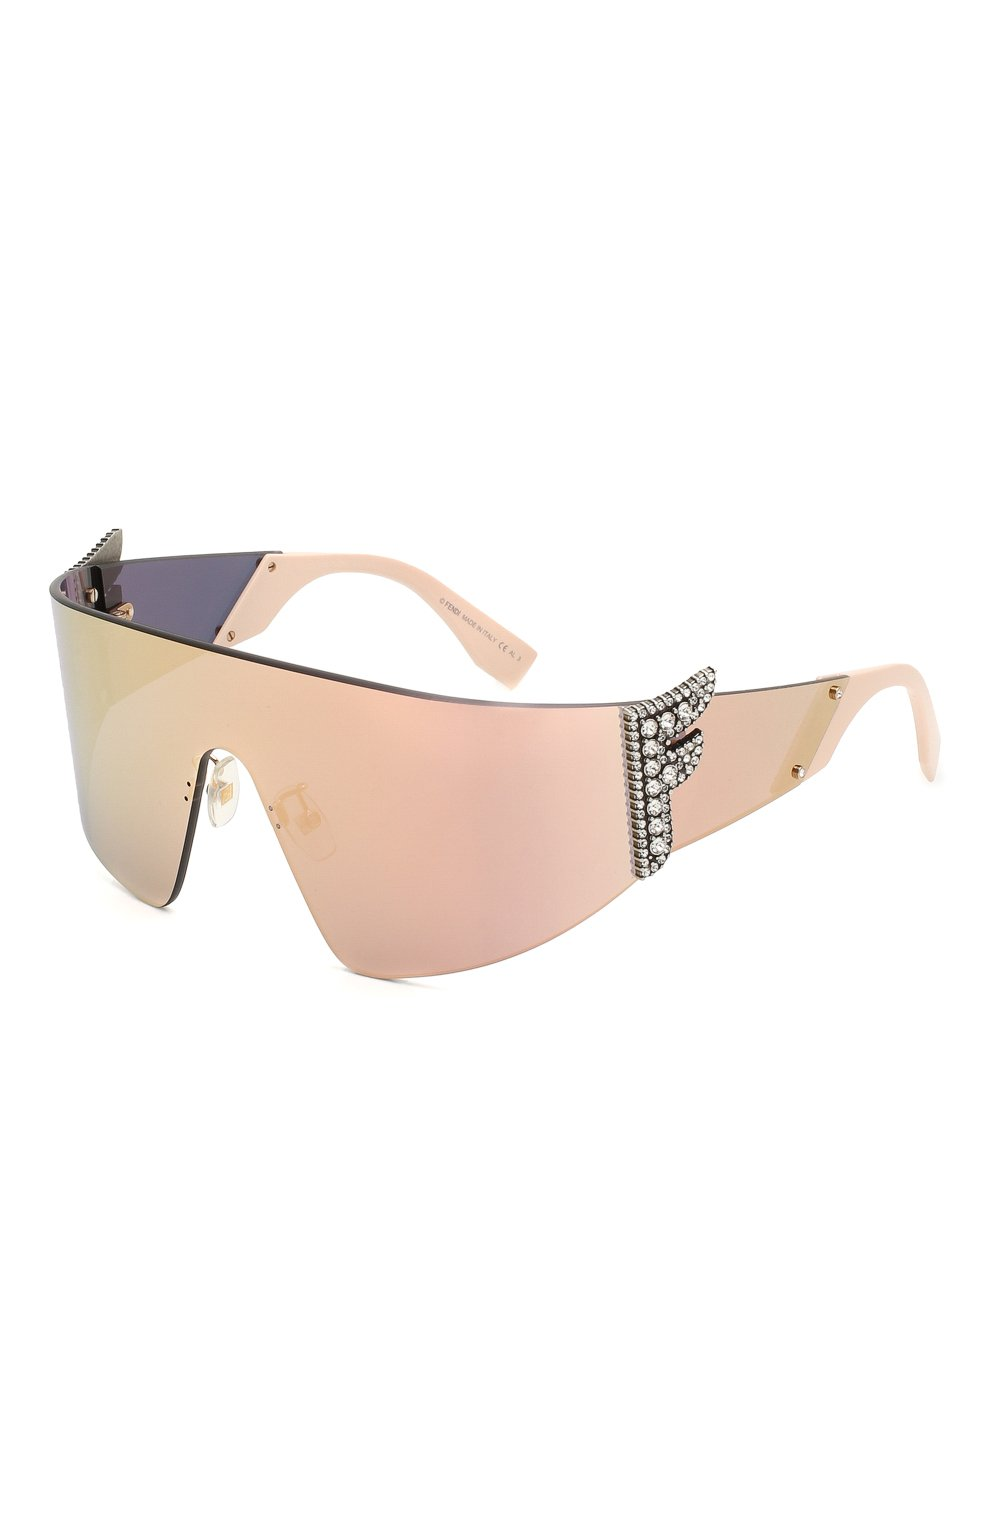 Женские солнцезащитные очки FENDI розового цвета, арт. 0382 35J   Фото 1